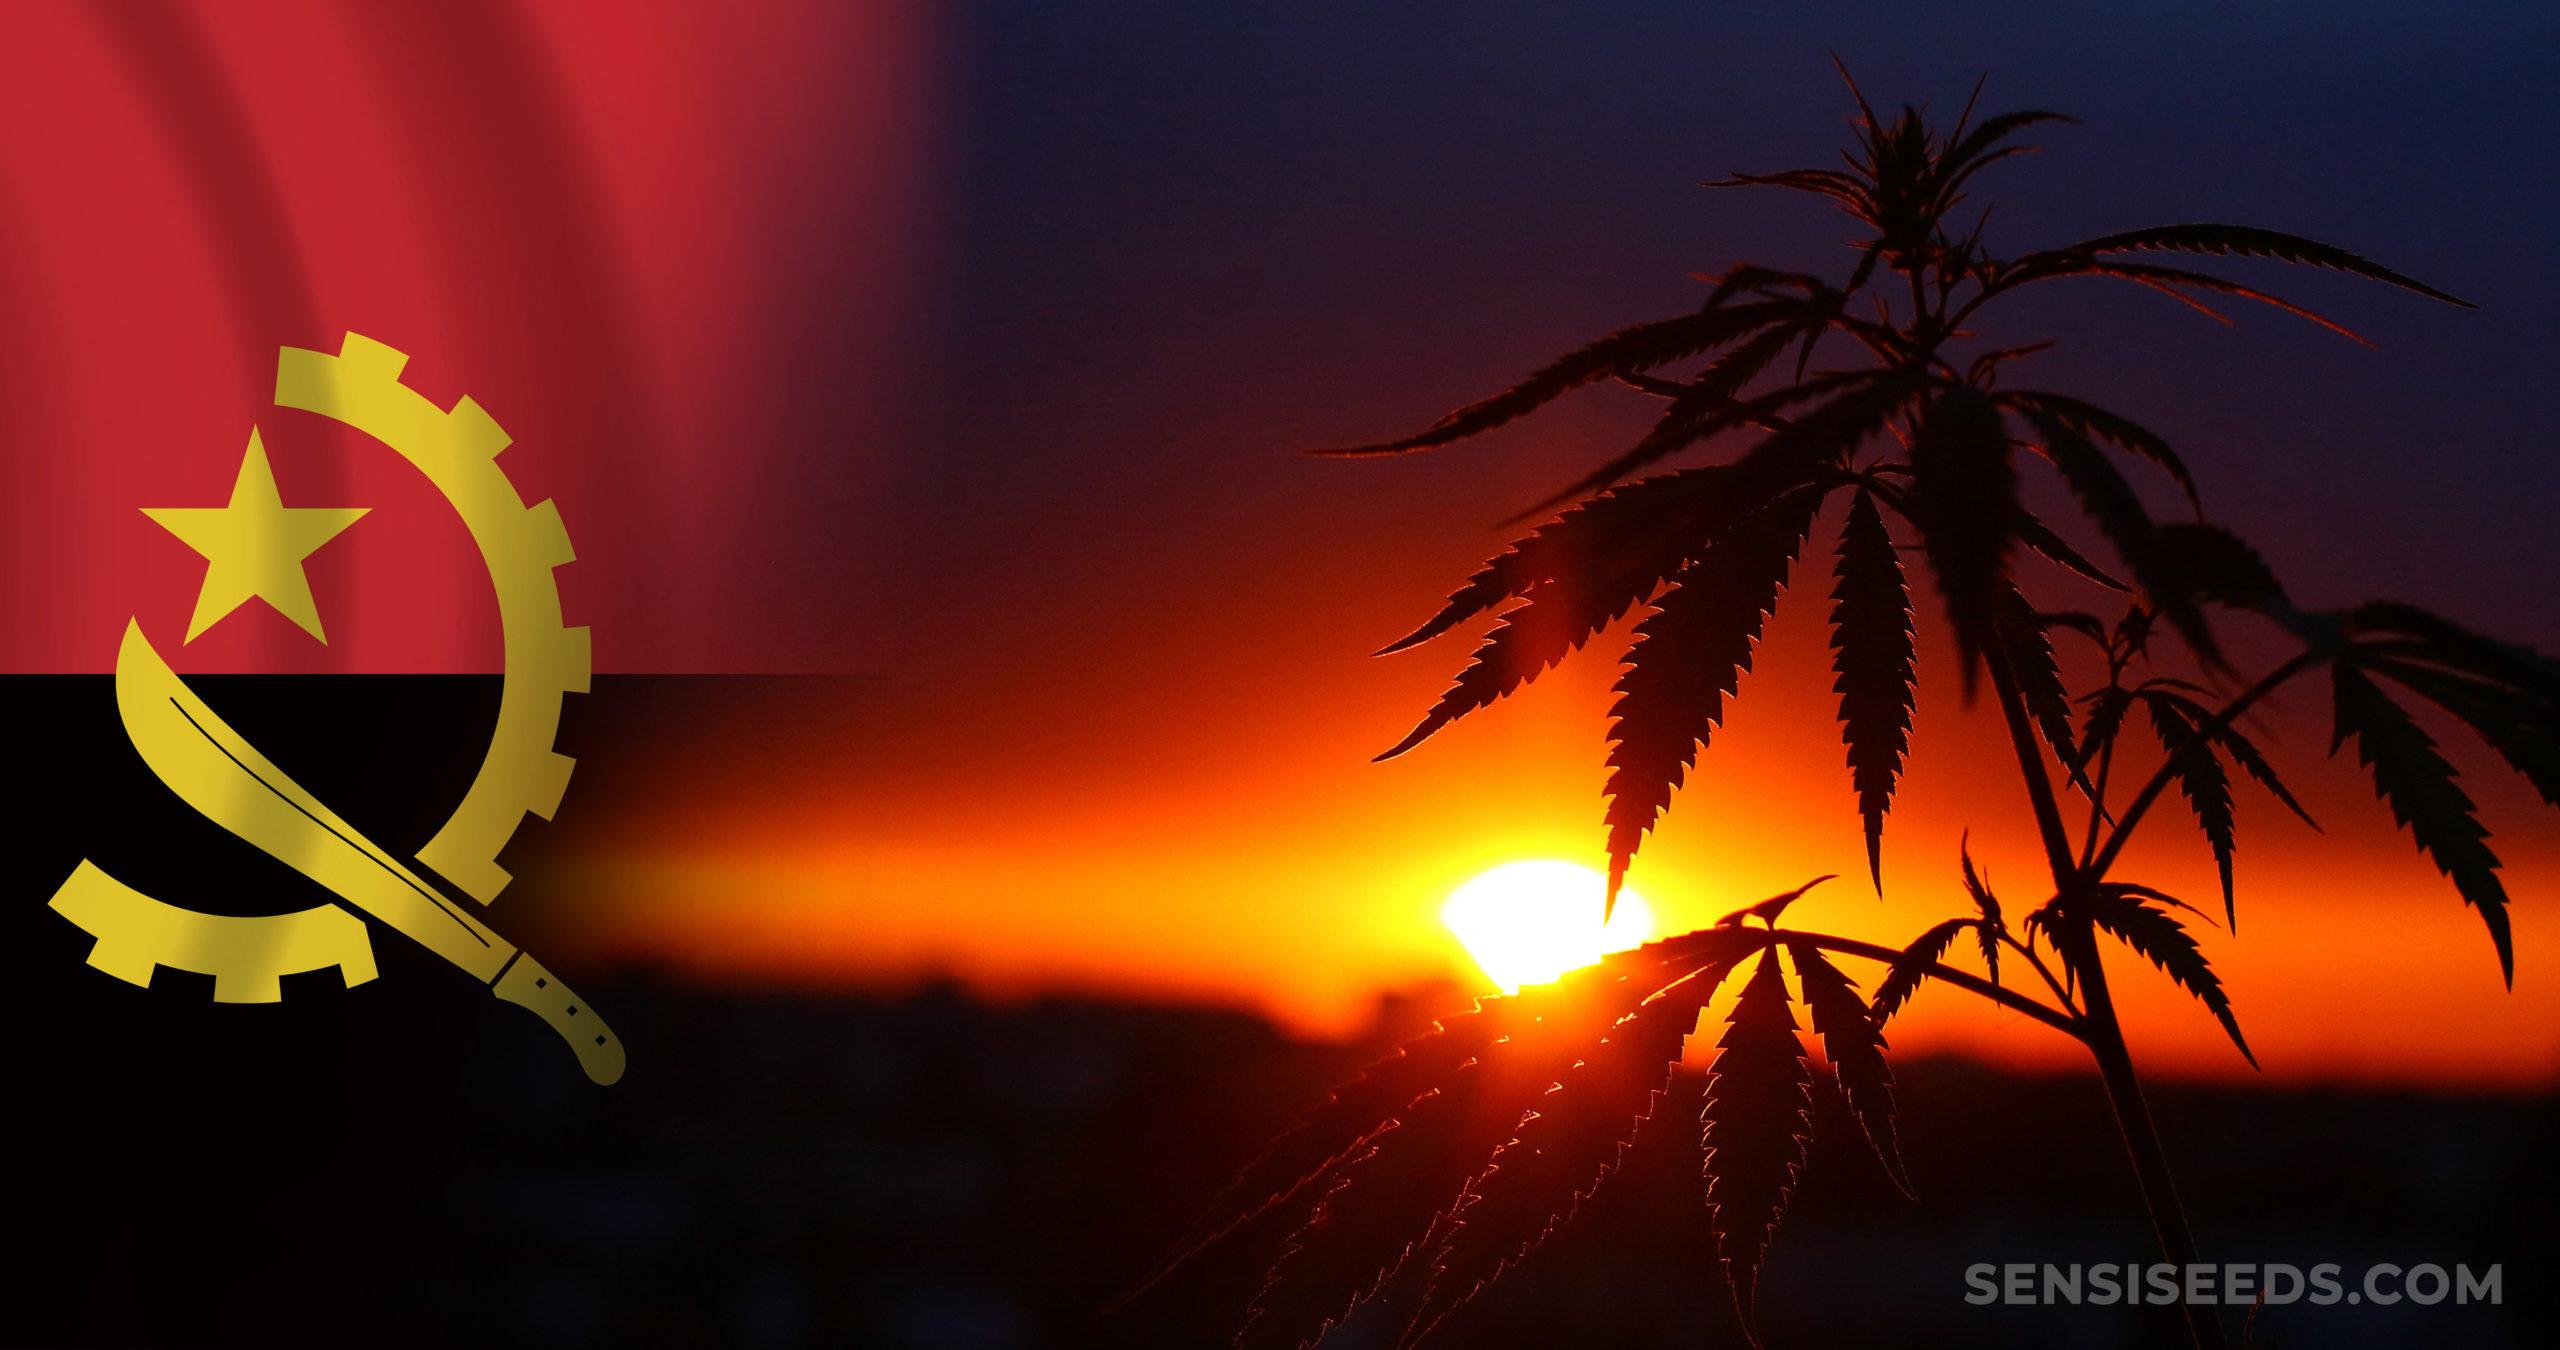 The Angola flag and a cannabis plant against a sunset